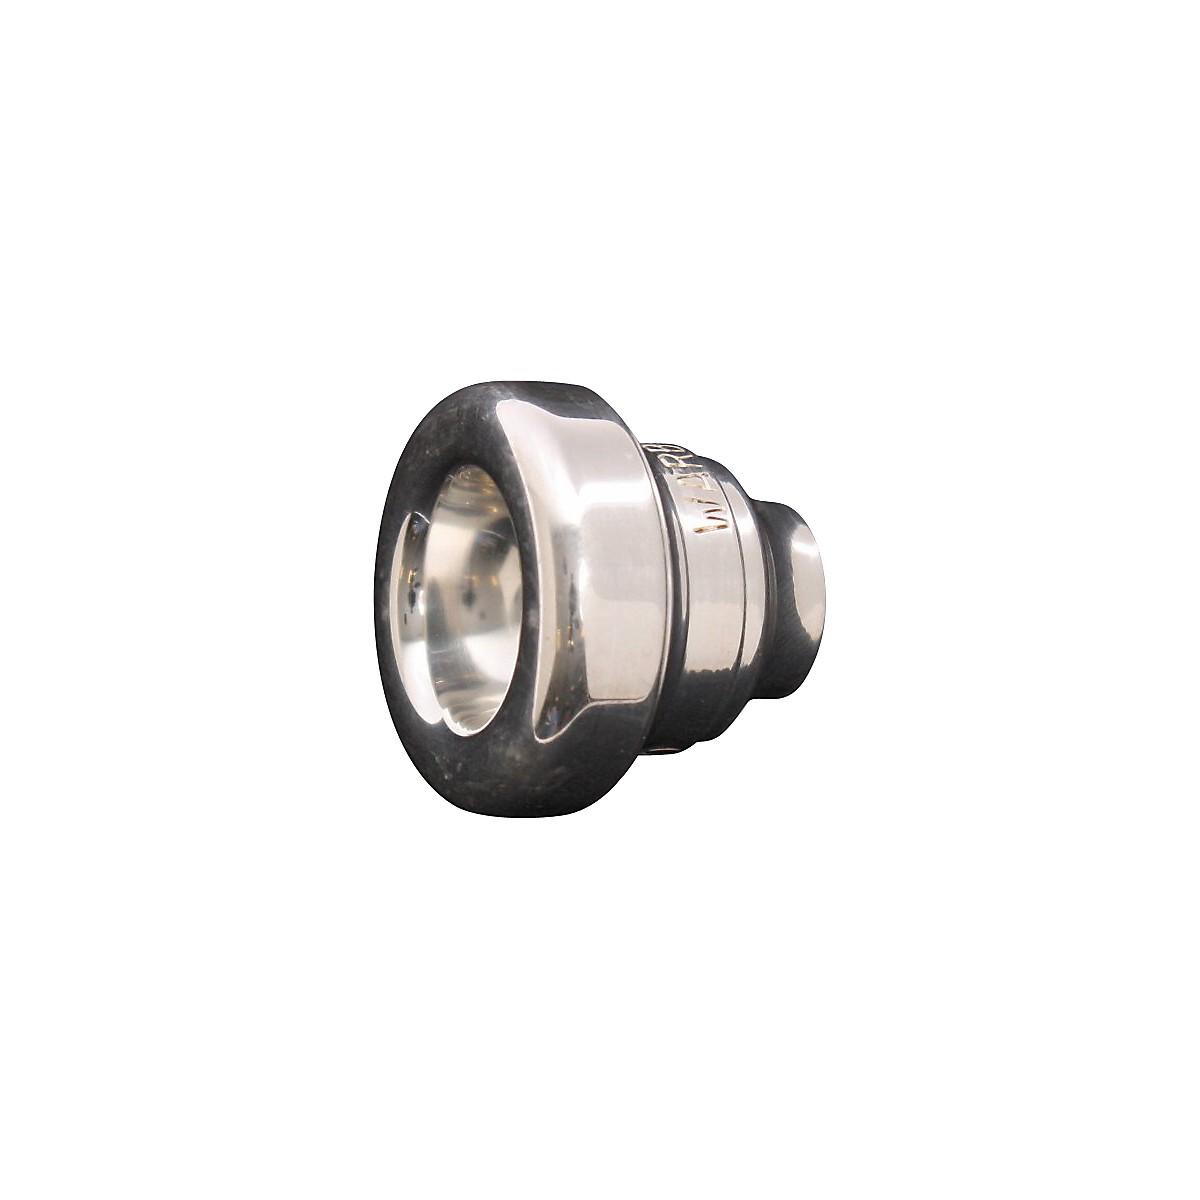 Warburton Two-Piece Tenor Trombone Mouthpiece System in Silver